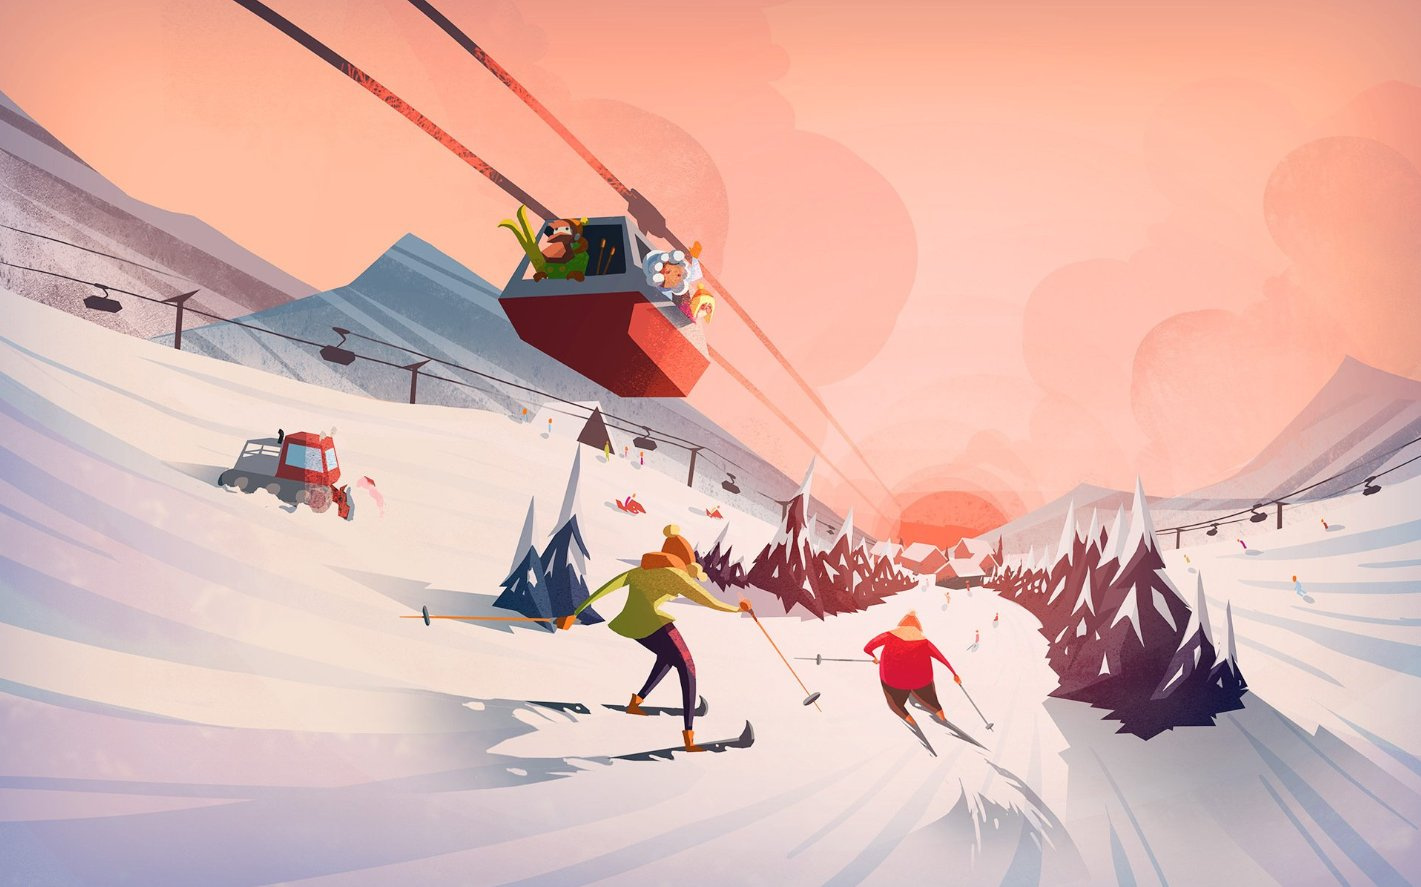 Симулятор Snowtopia: Ski Resort Tycoon вышел в ранний доступ